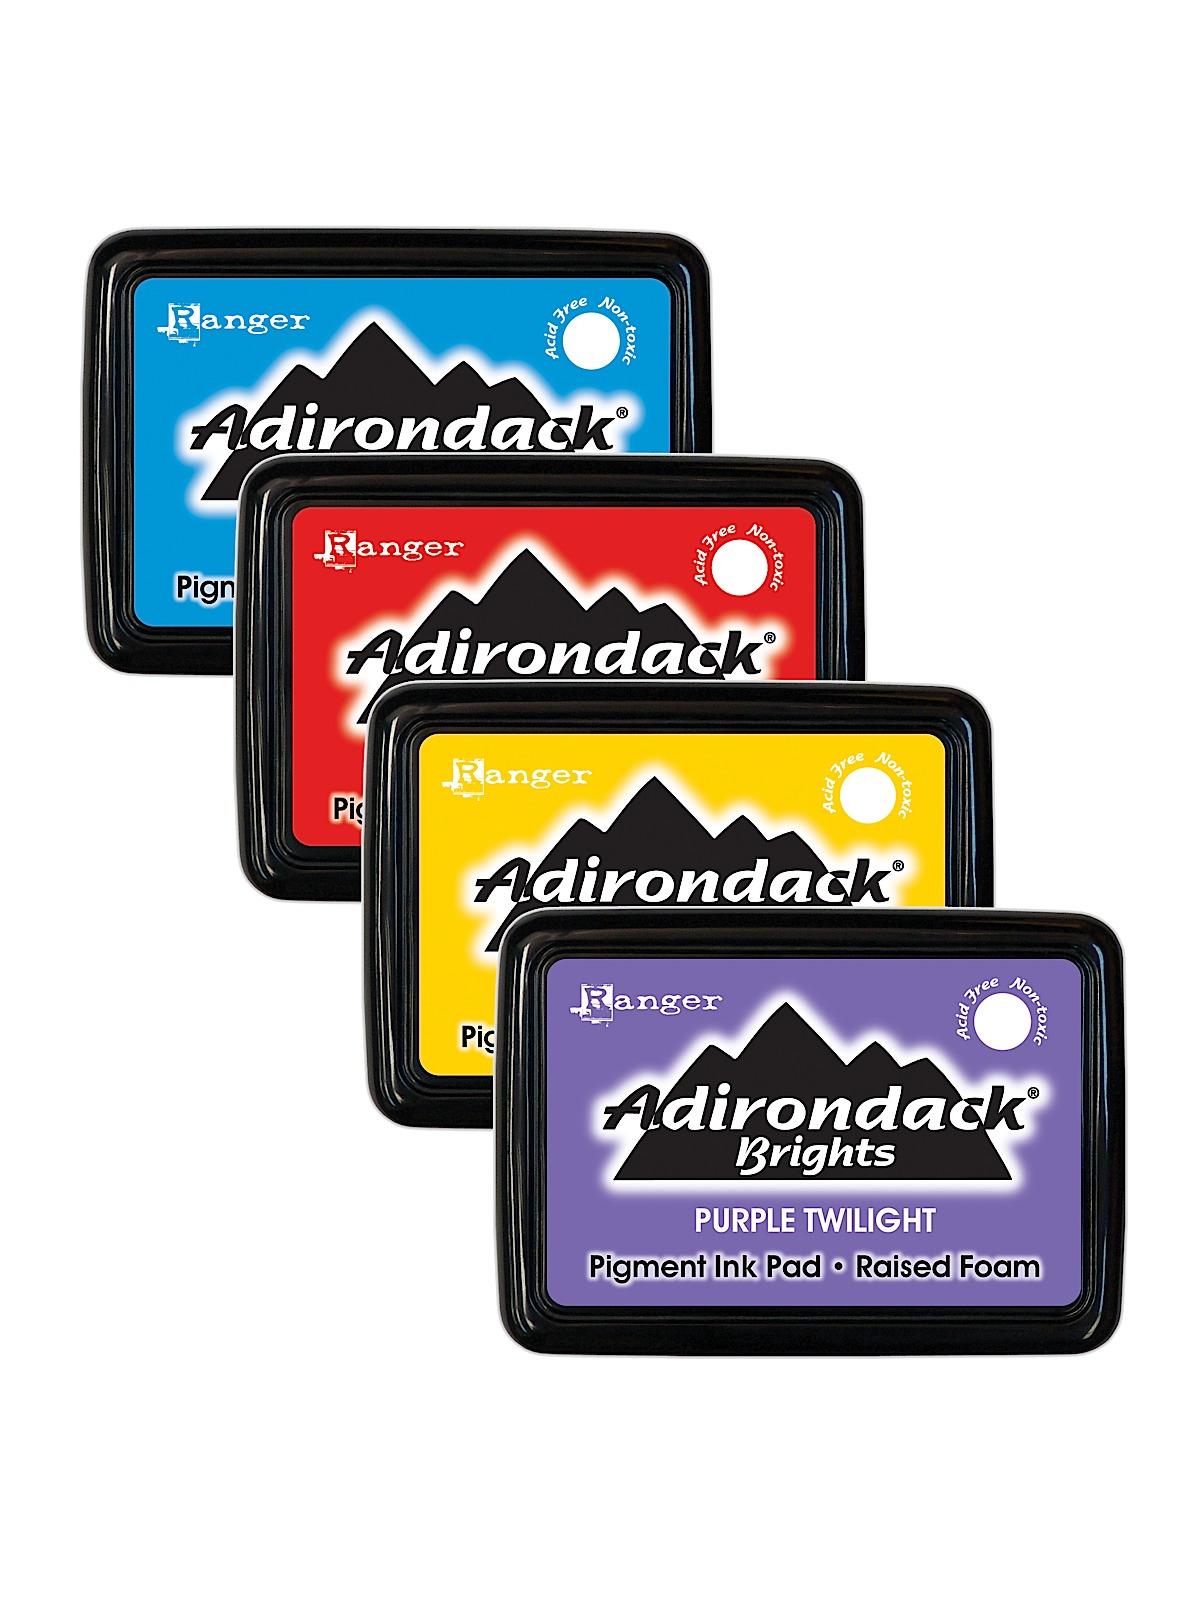 Ranger - Adirondack Pigment Pads and reinkers